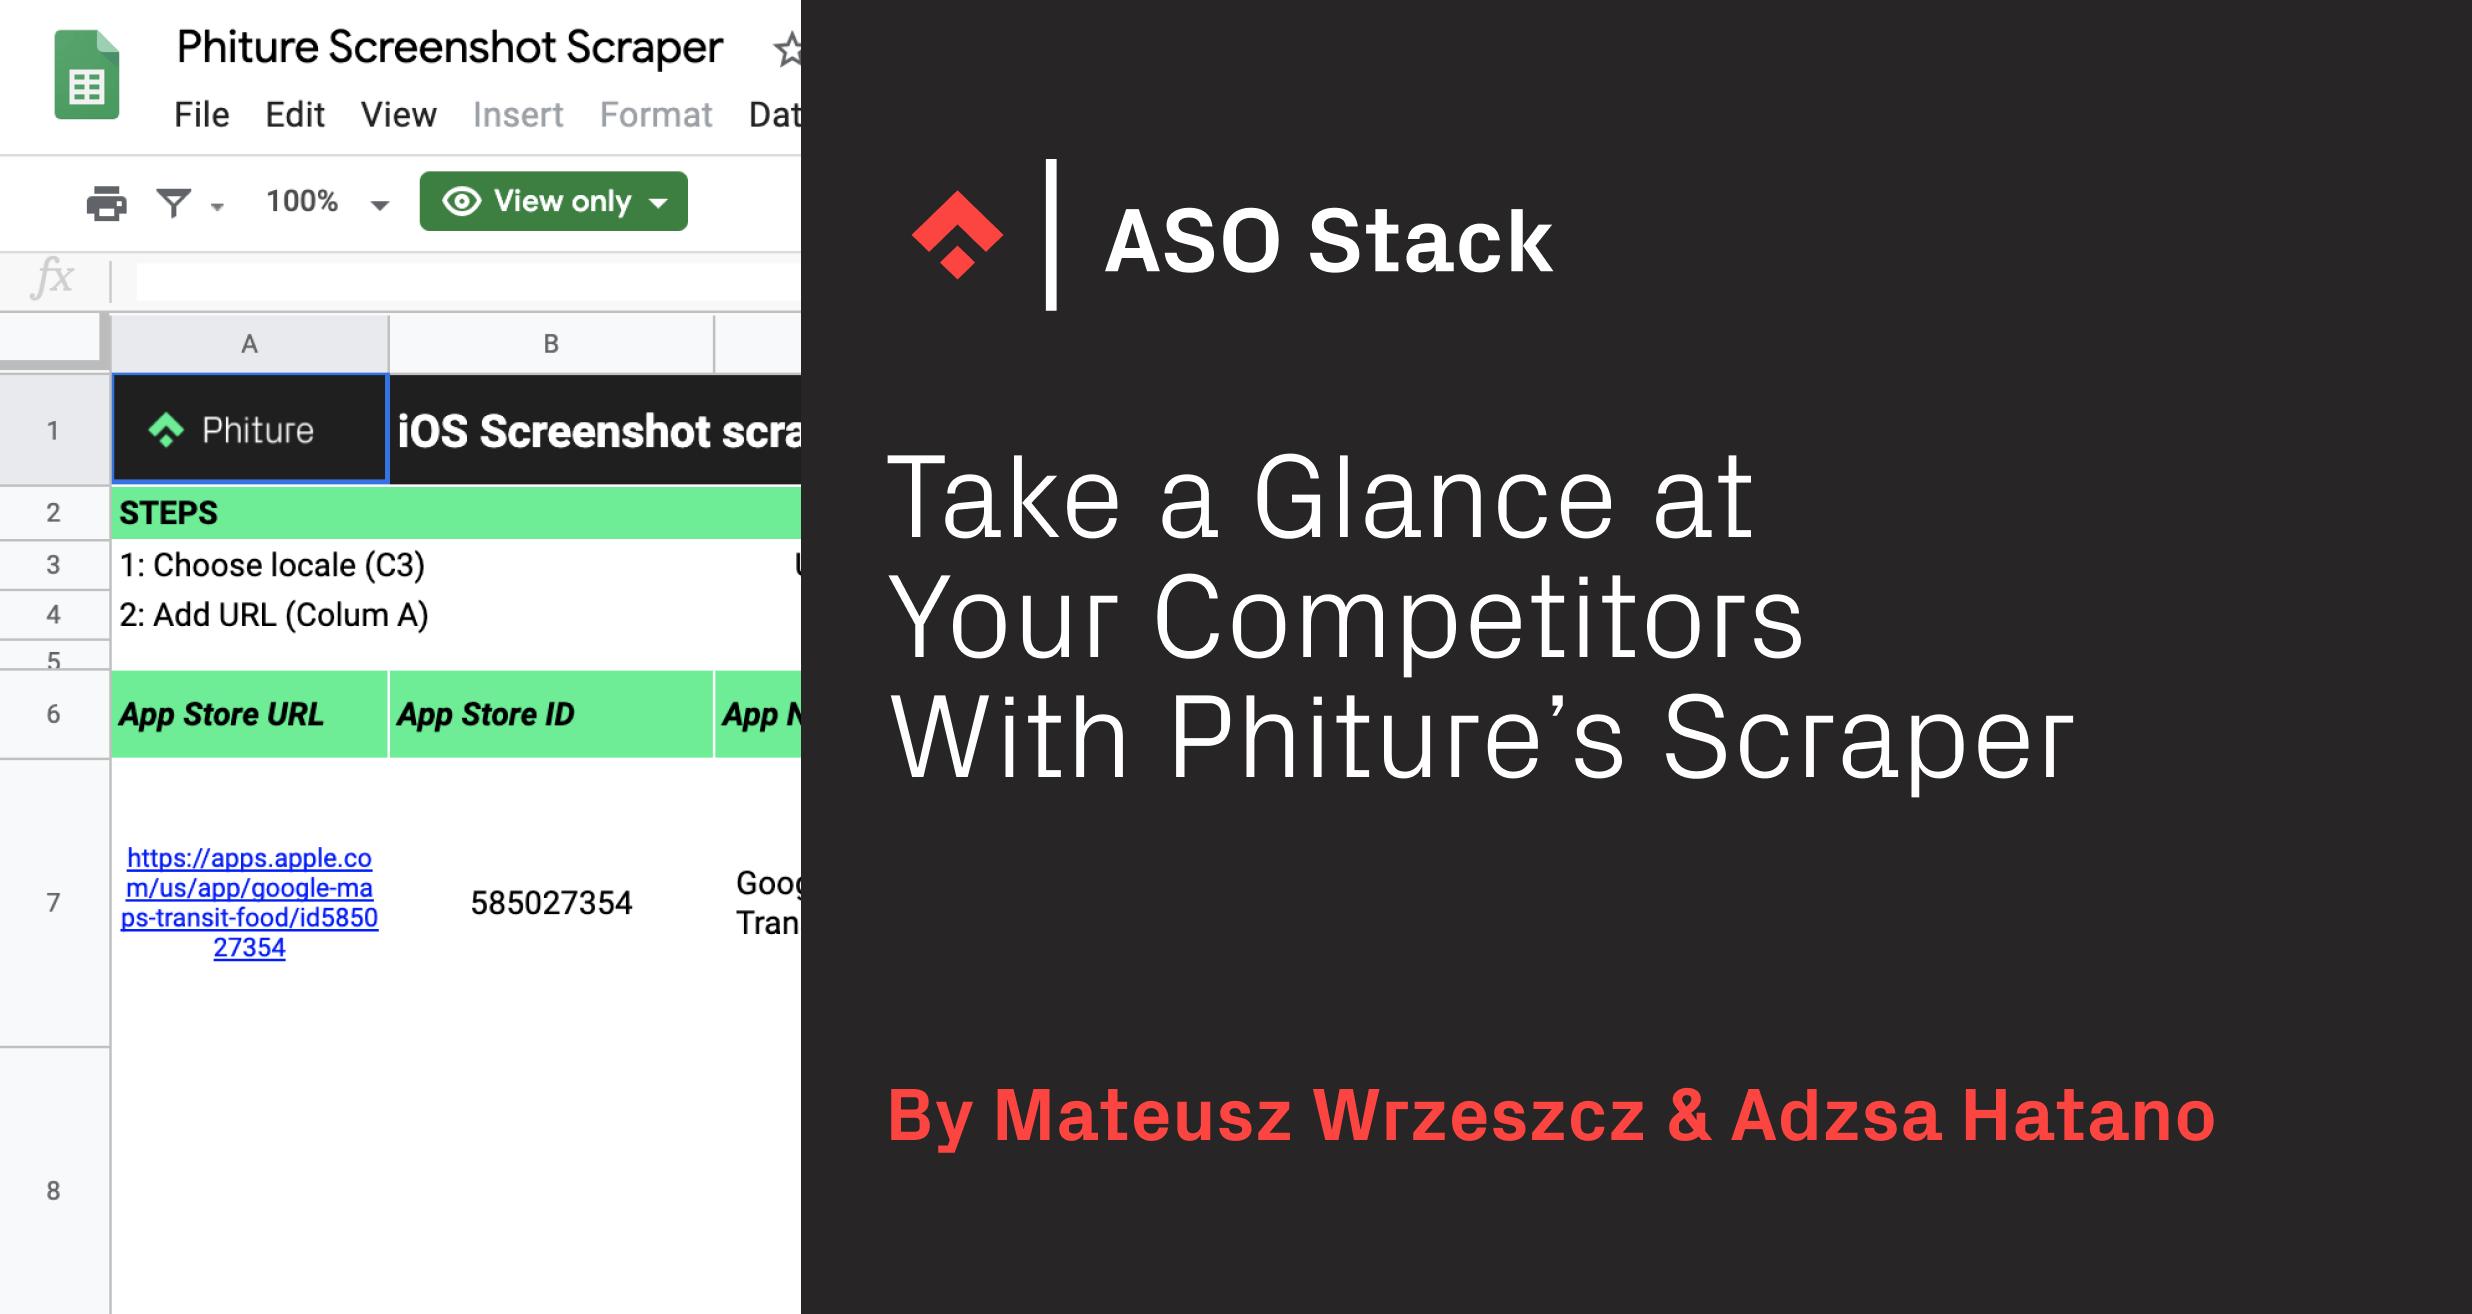 Phiture Screenshot Scraper